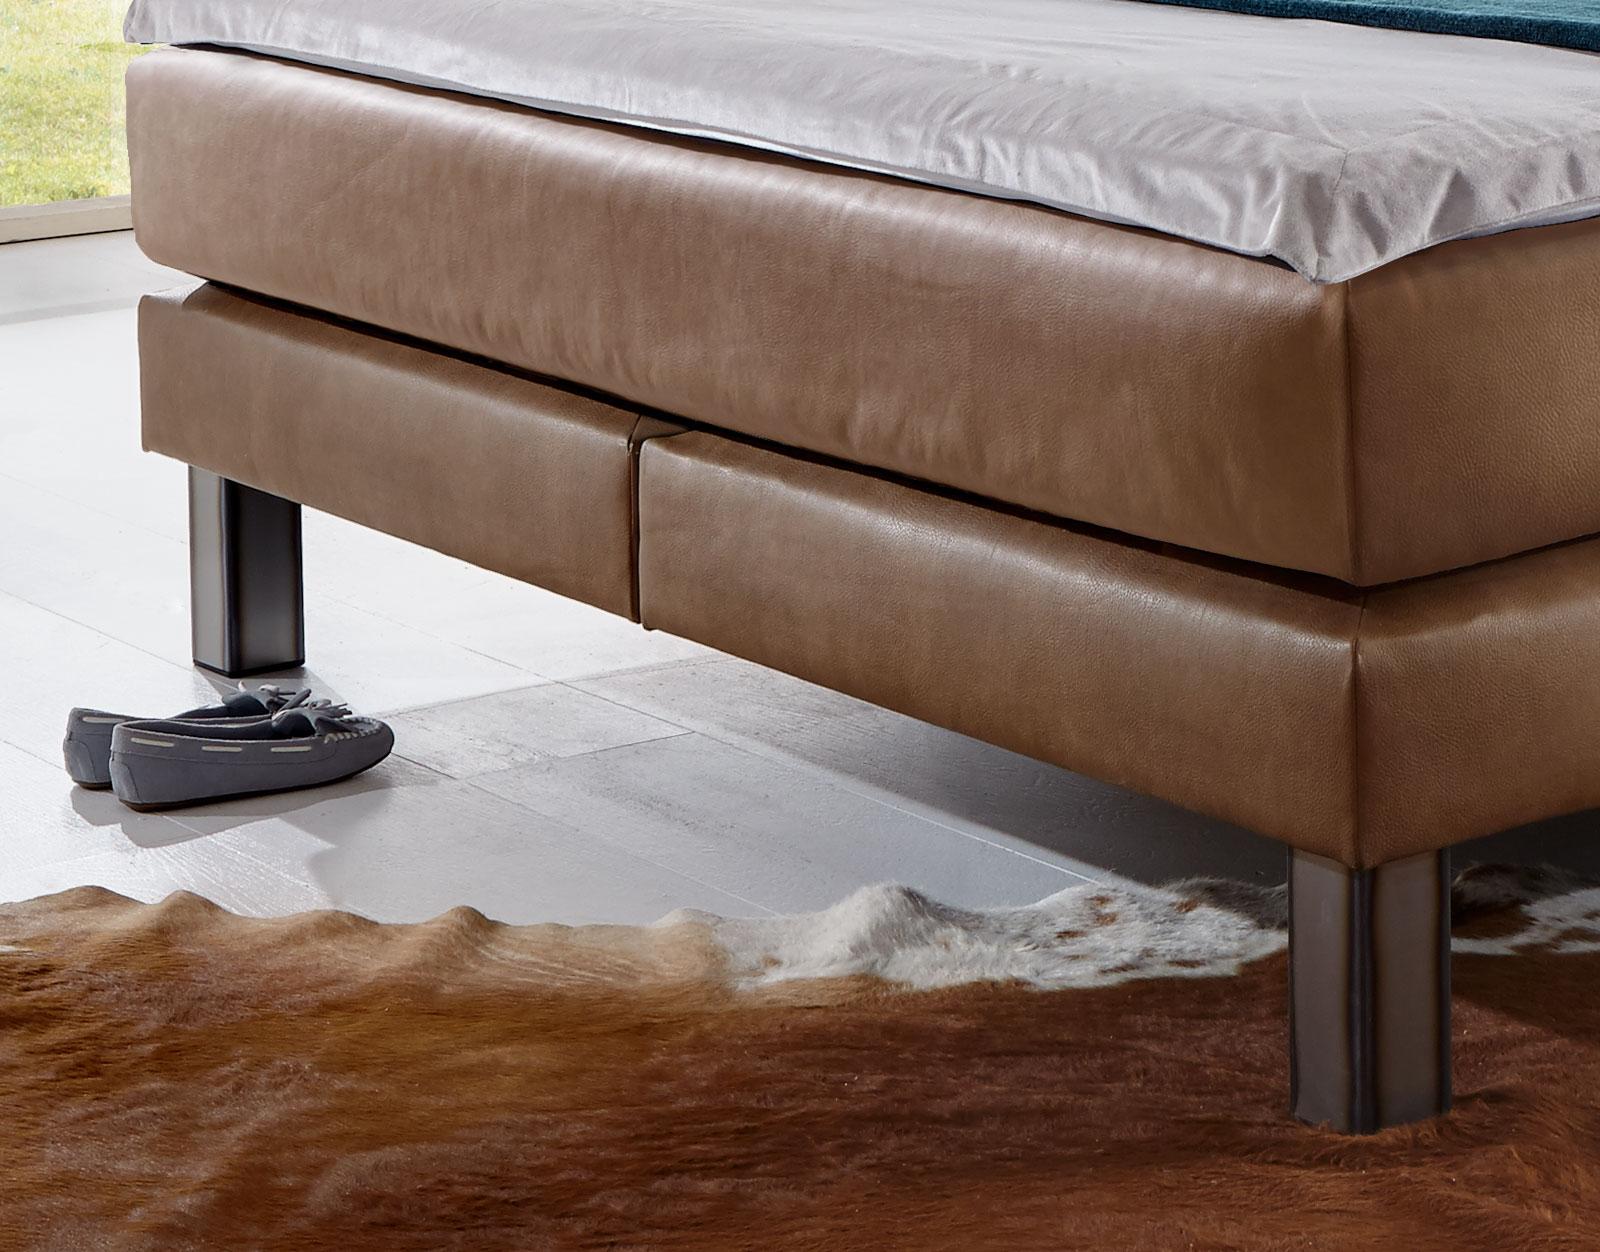 kunstleder boxspringbett im modernen landhausstil kastilia. Black Bedroom Furniture Sets. Home Design Ideas